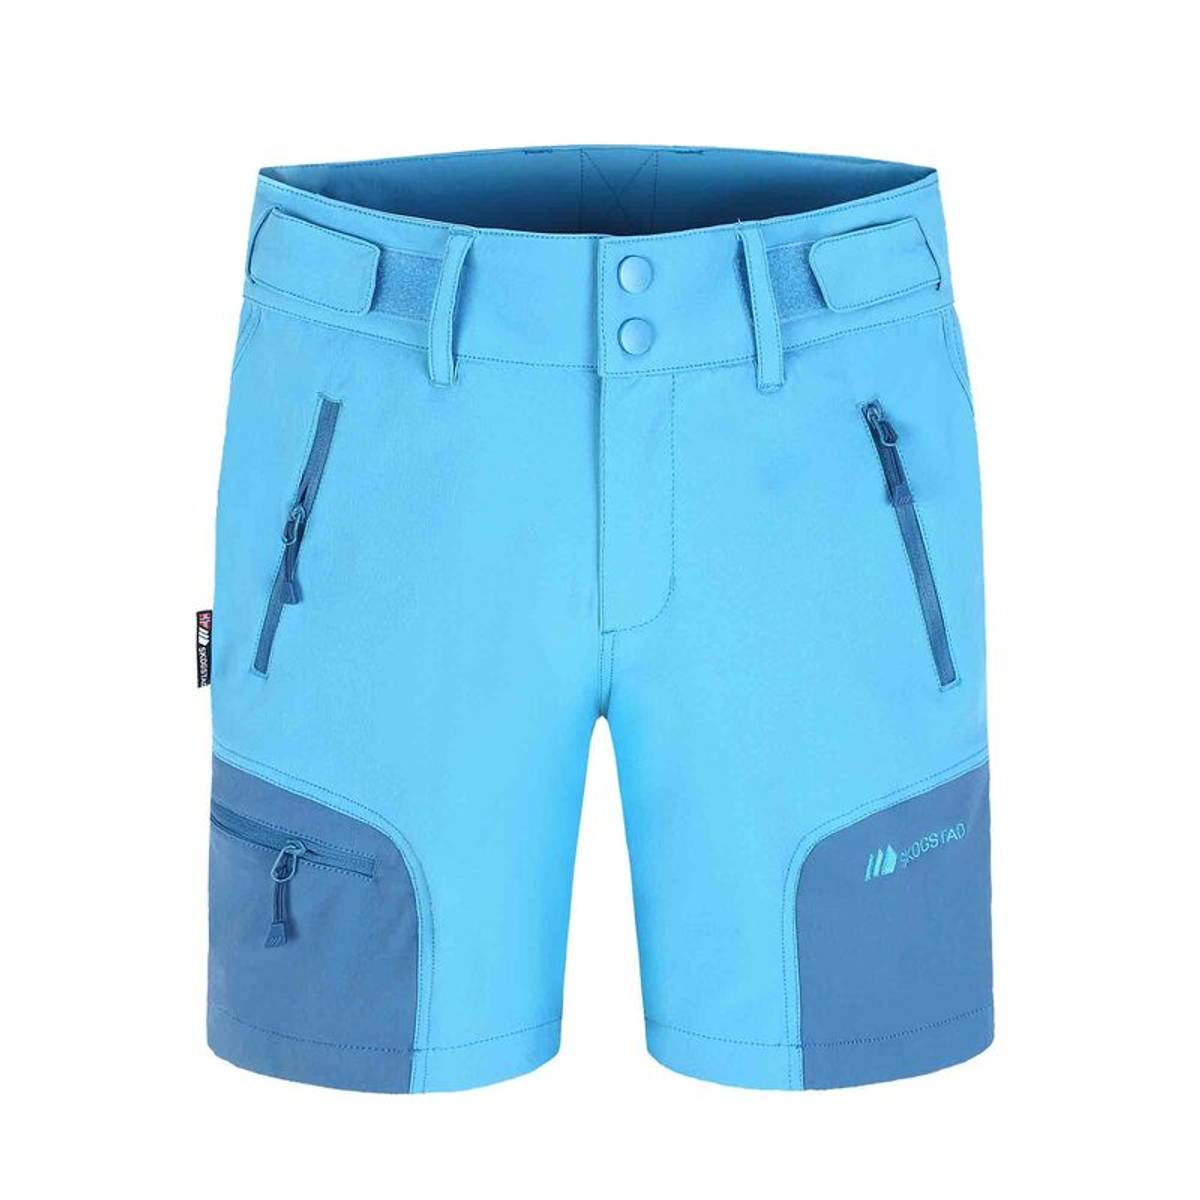 SKOGSTAD - HOVDE SHORTS, MALIBU BLUE